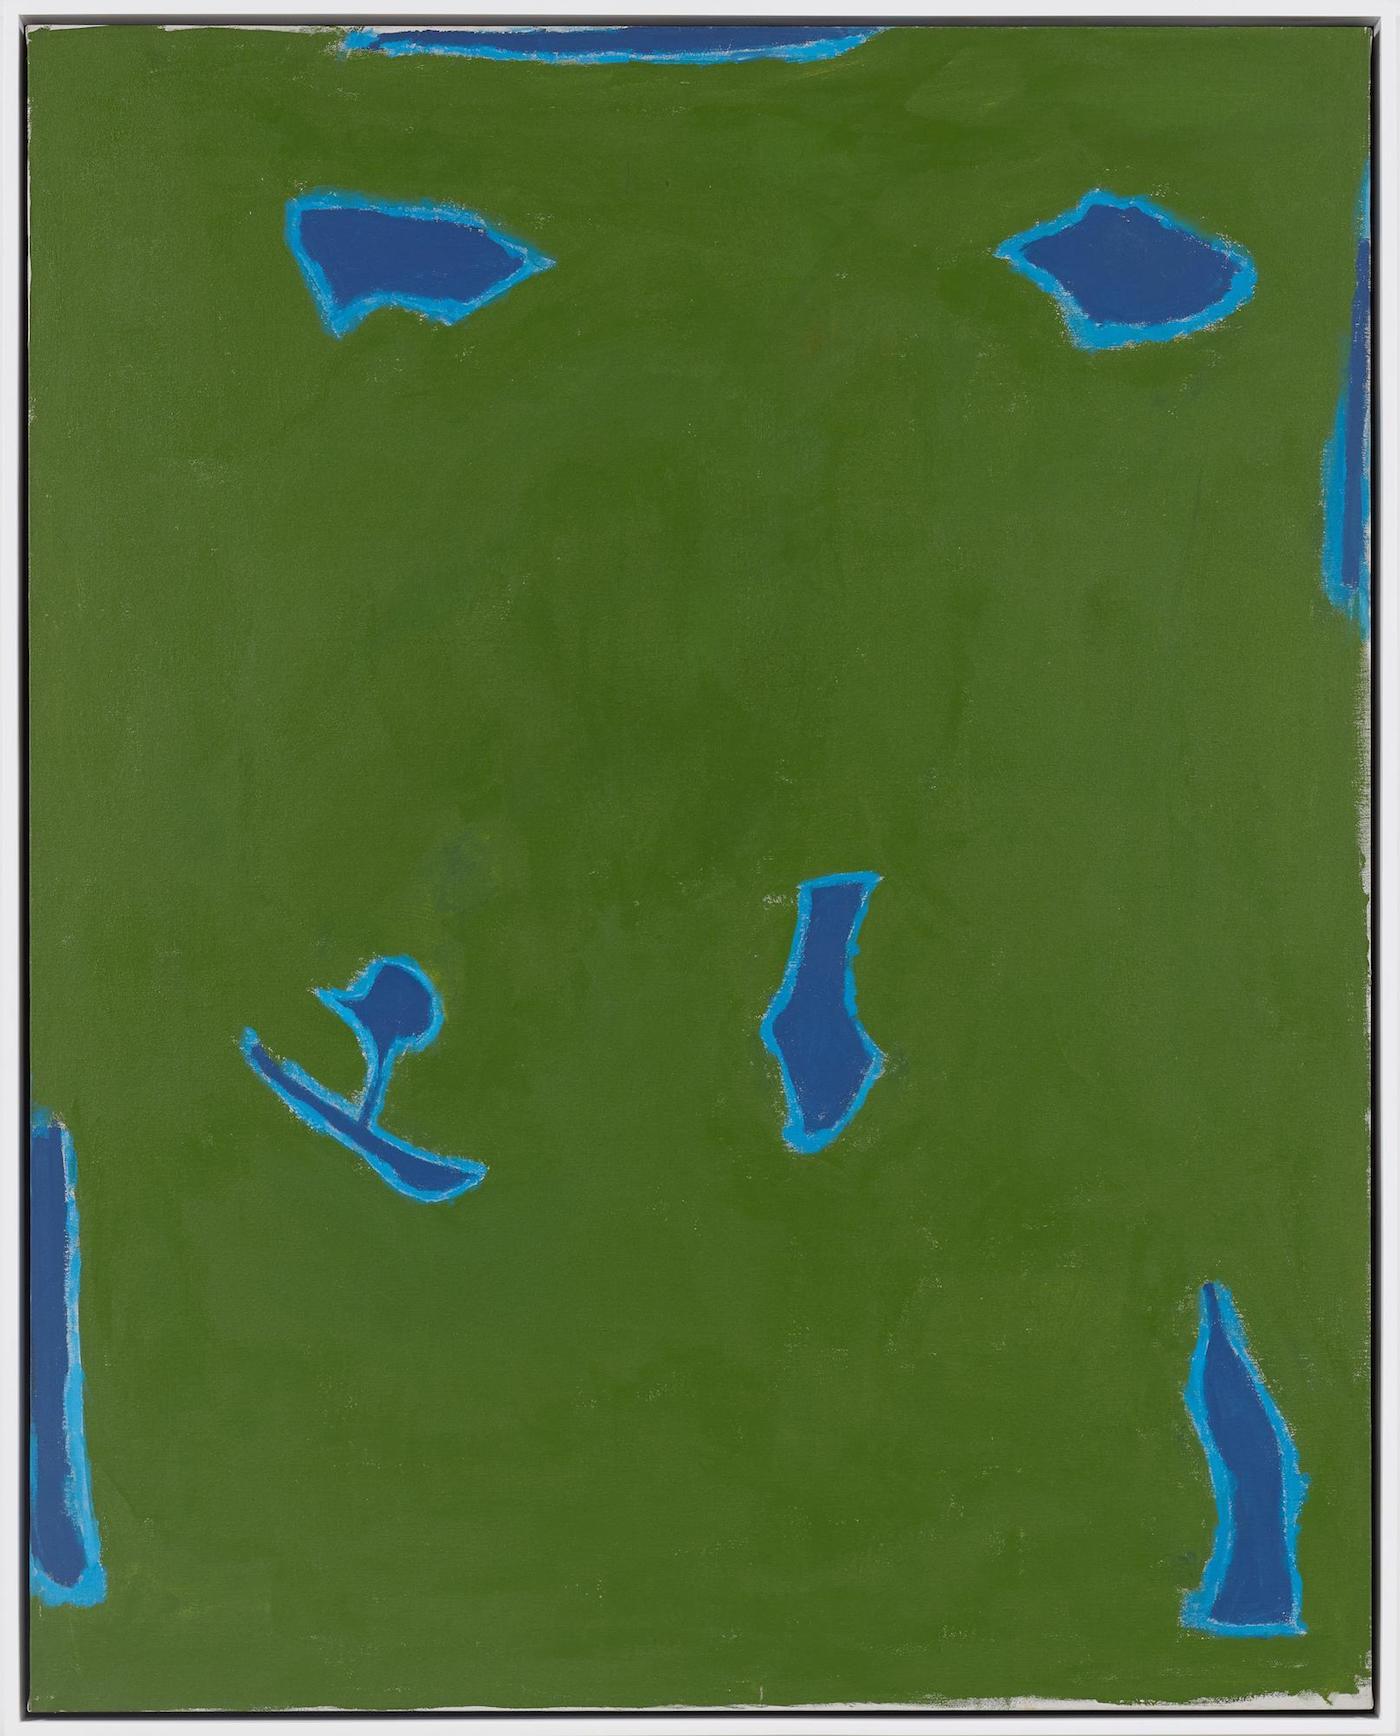 Parsons_Bird_in_a_Boat_1971_framed_resized0.jpg